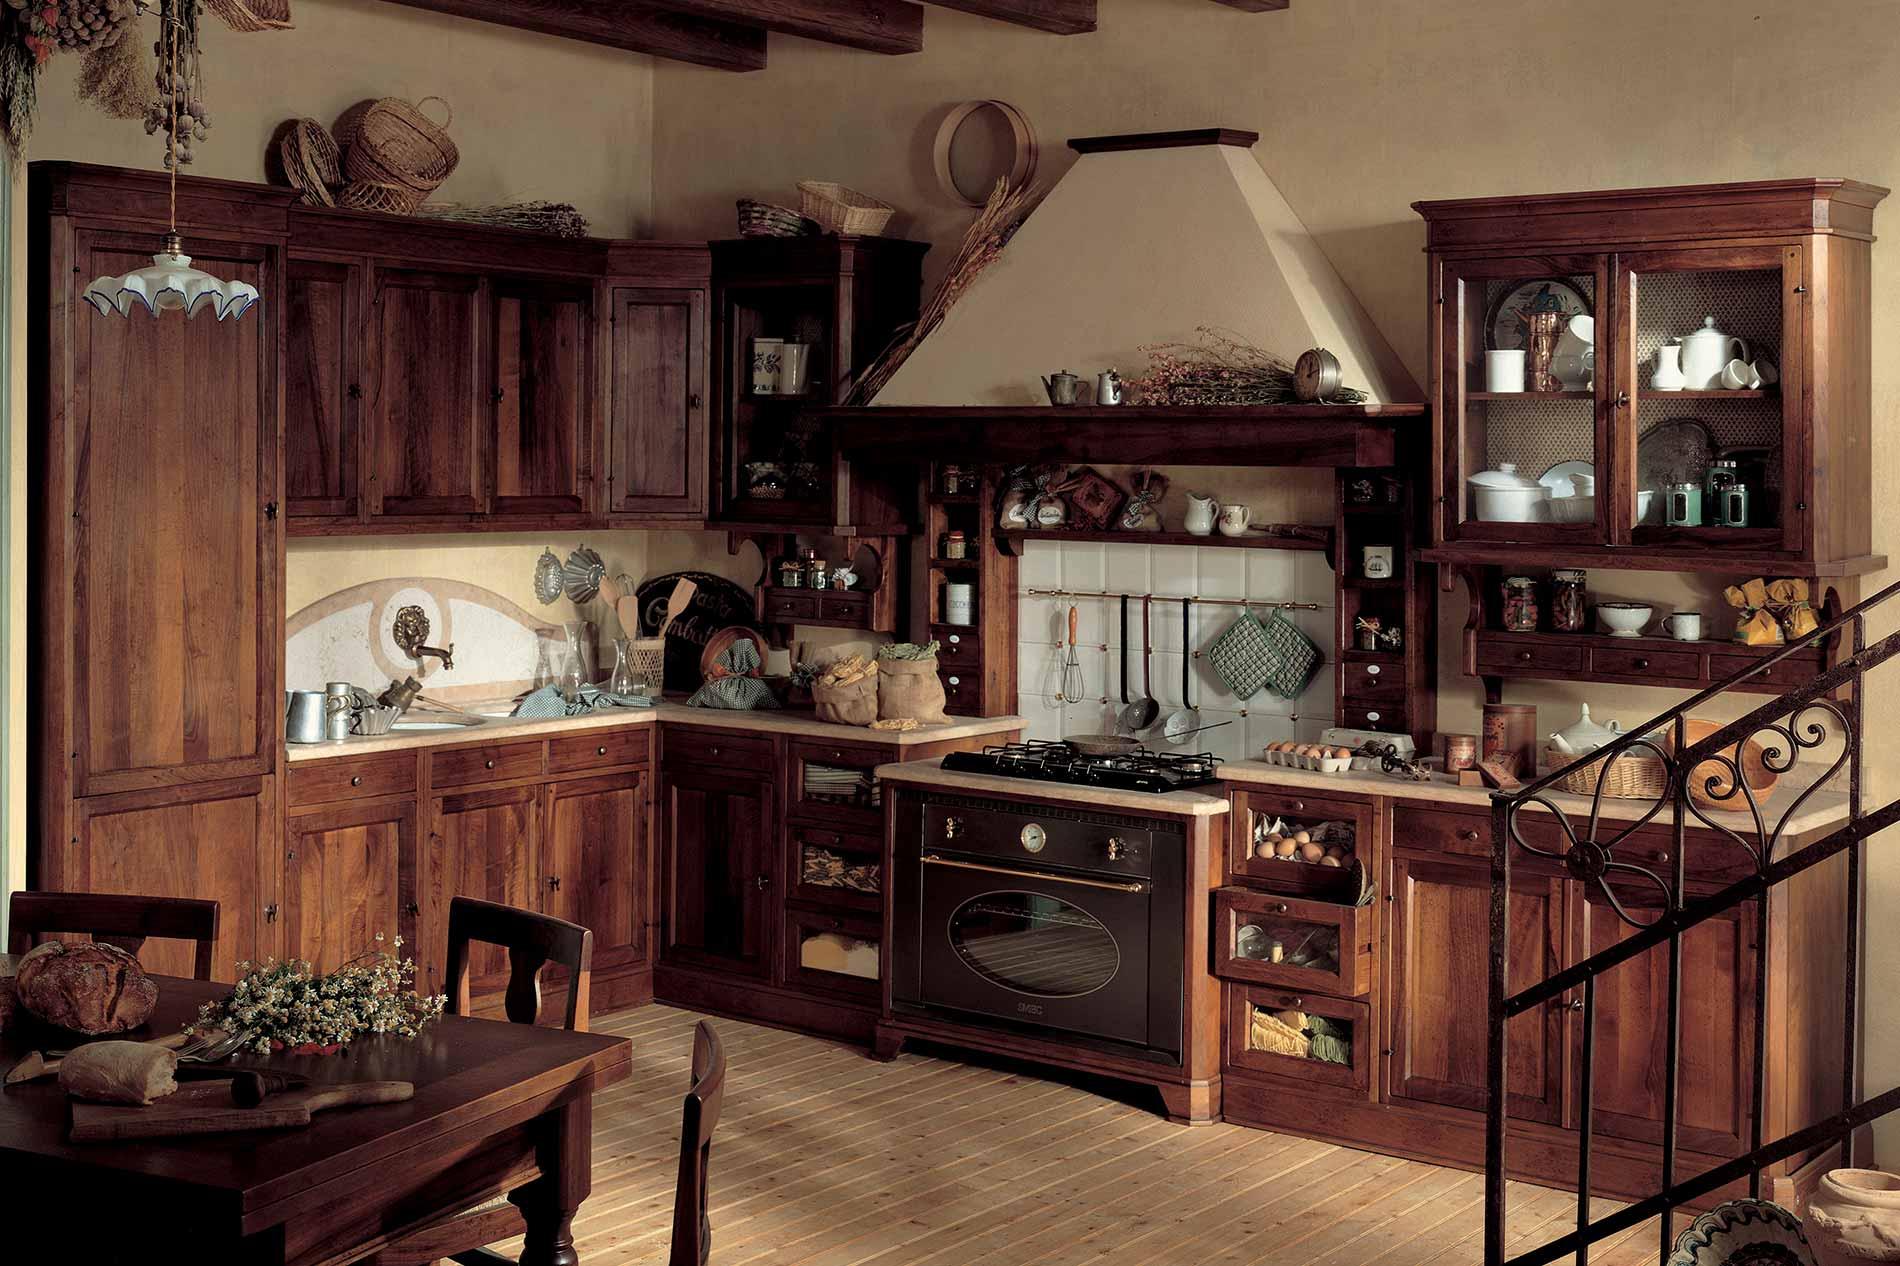 Doralice - Marchi Cucine Made in Italy